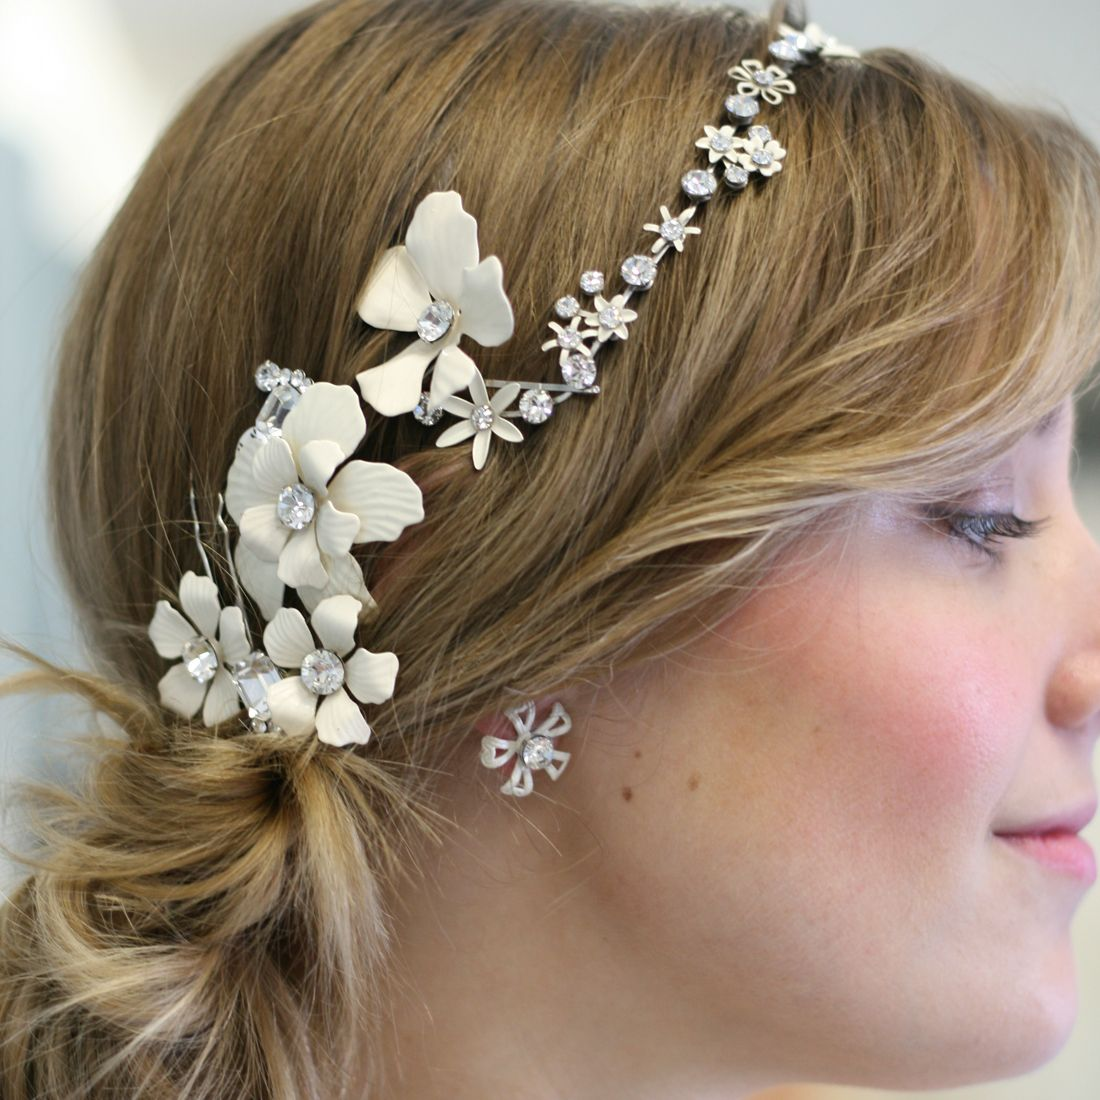 paris wedding hair accessories alta moda bridal | jewelry